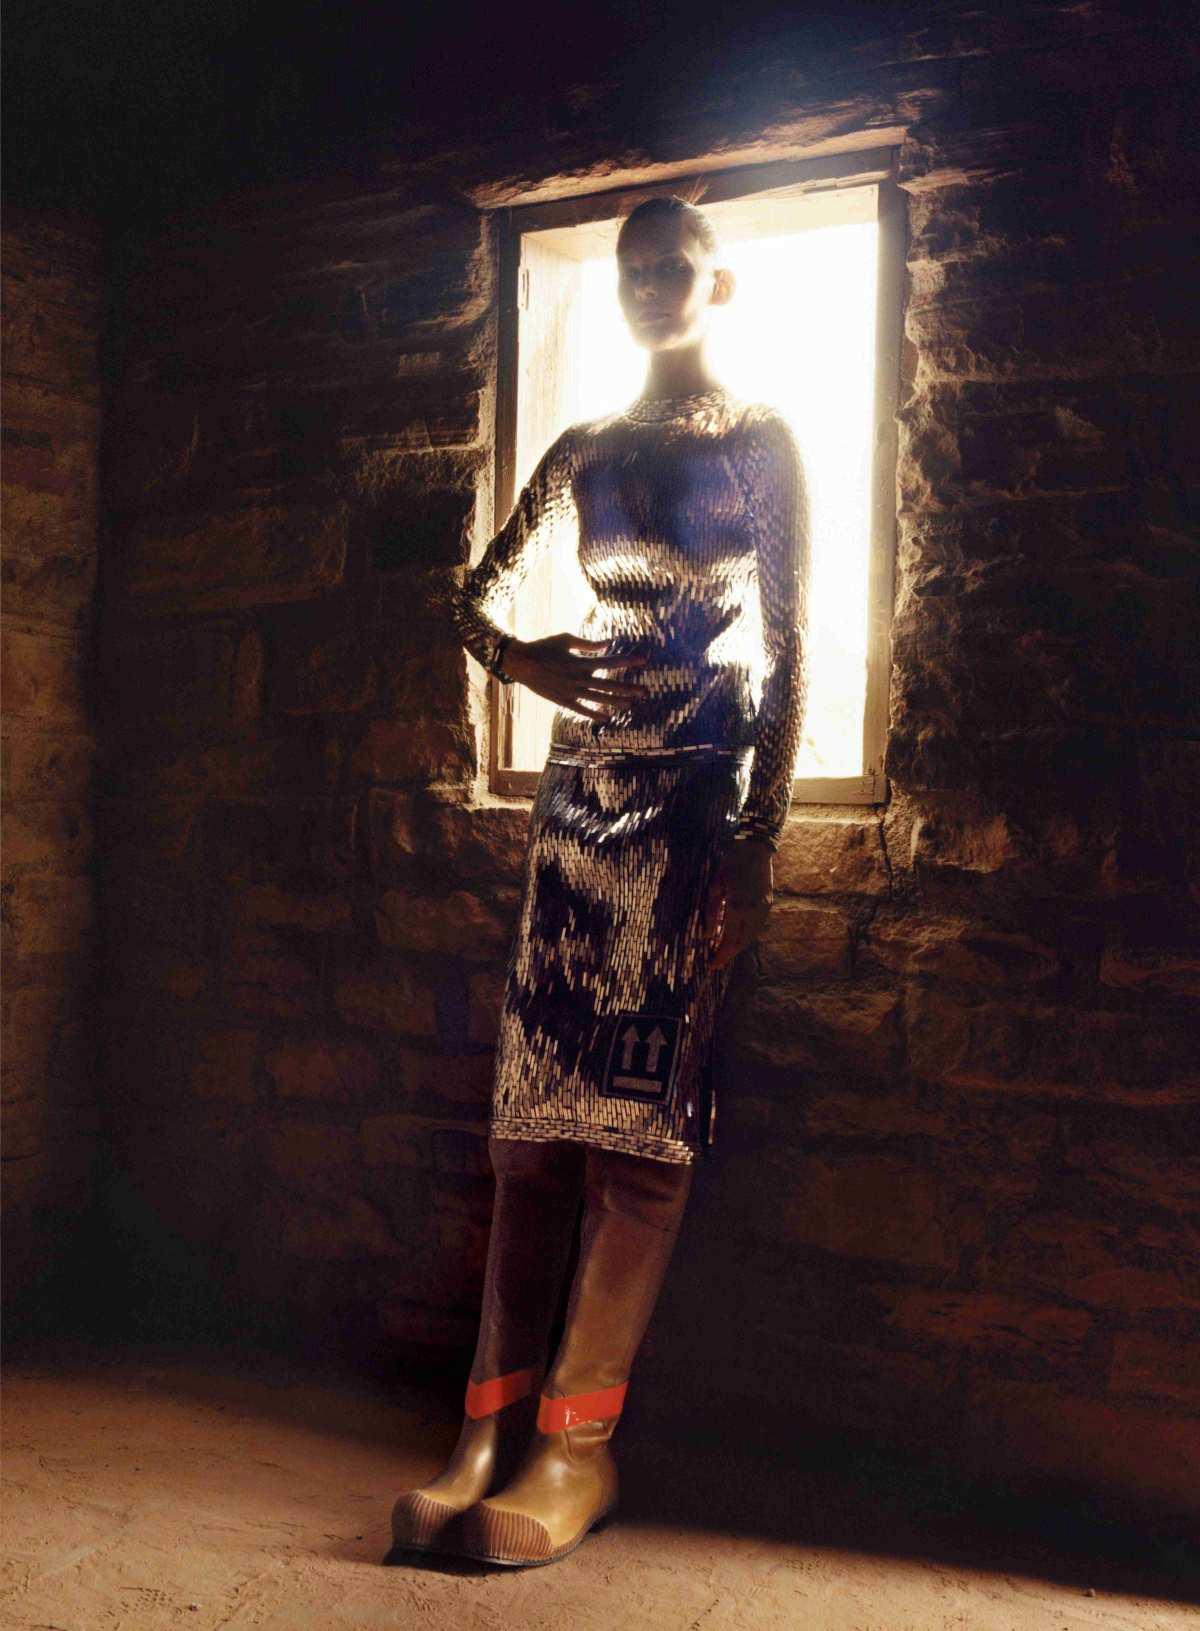 Amanda Murphy Saffron Vadher by Jamie Hawkesworth for Vogue US Oct 2018 (5).jpg